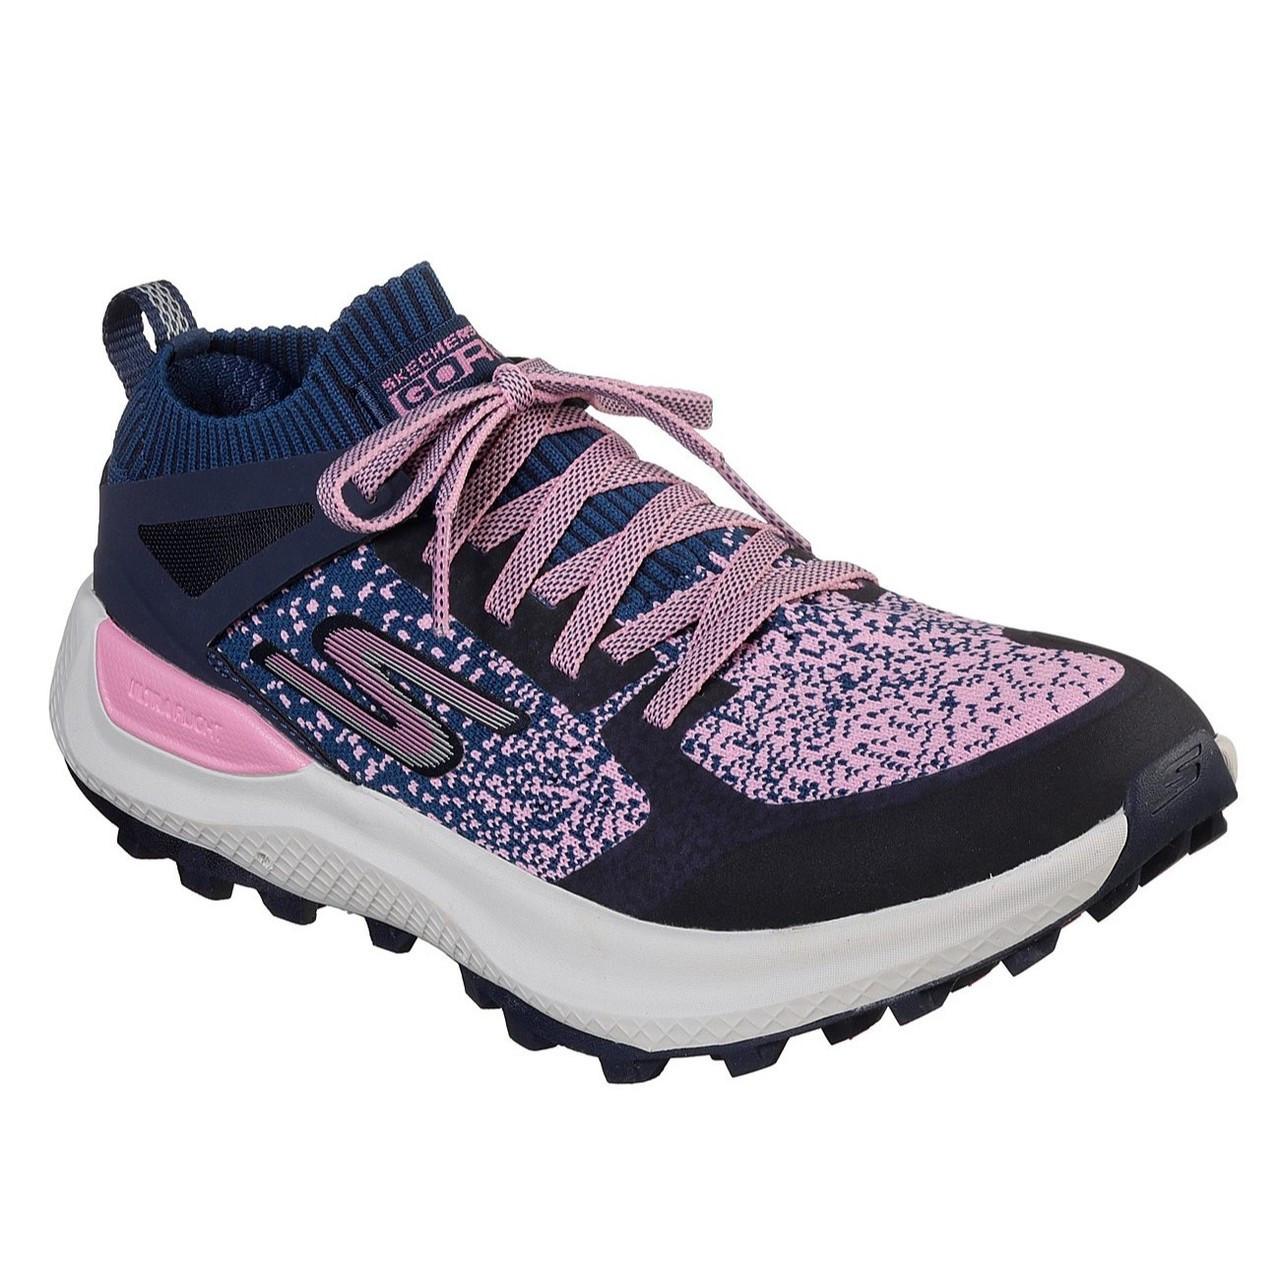 GOrun MaxTrail 5 Ultra Shoe